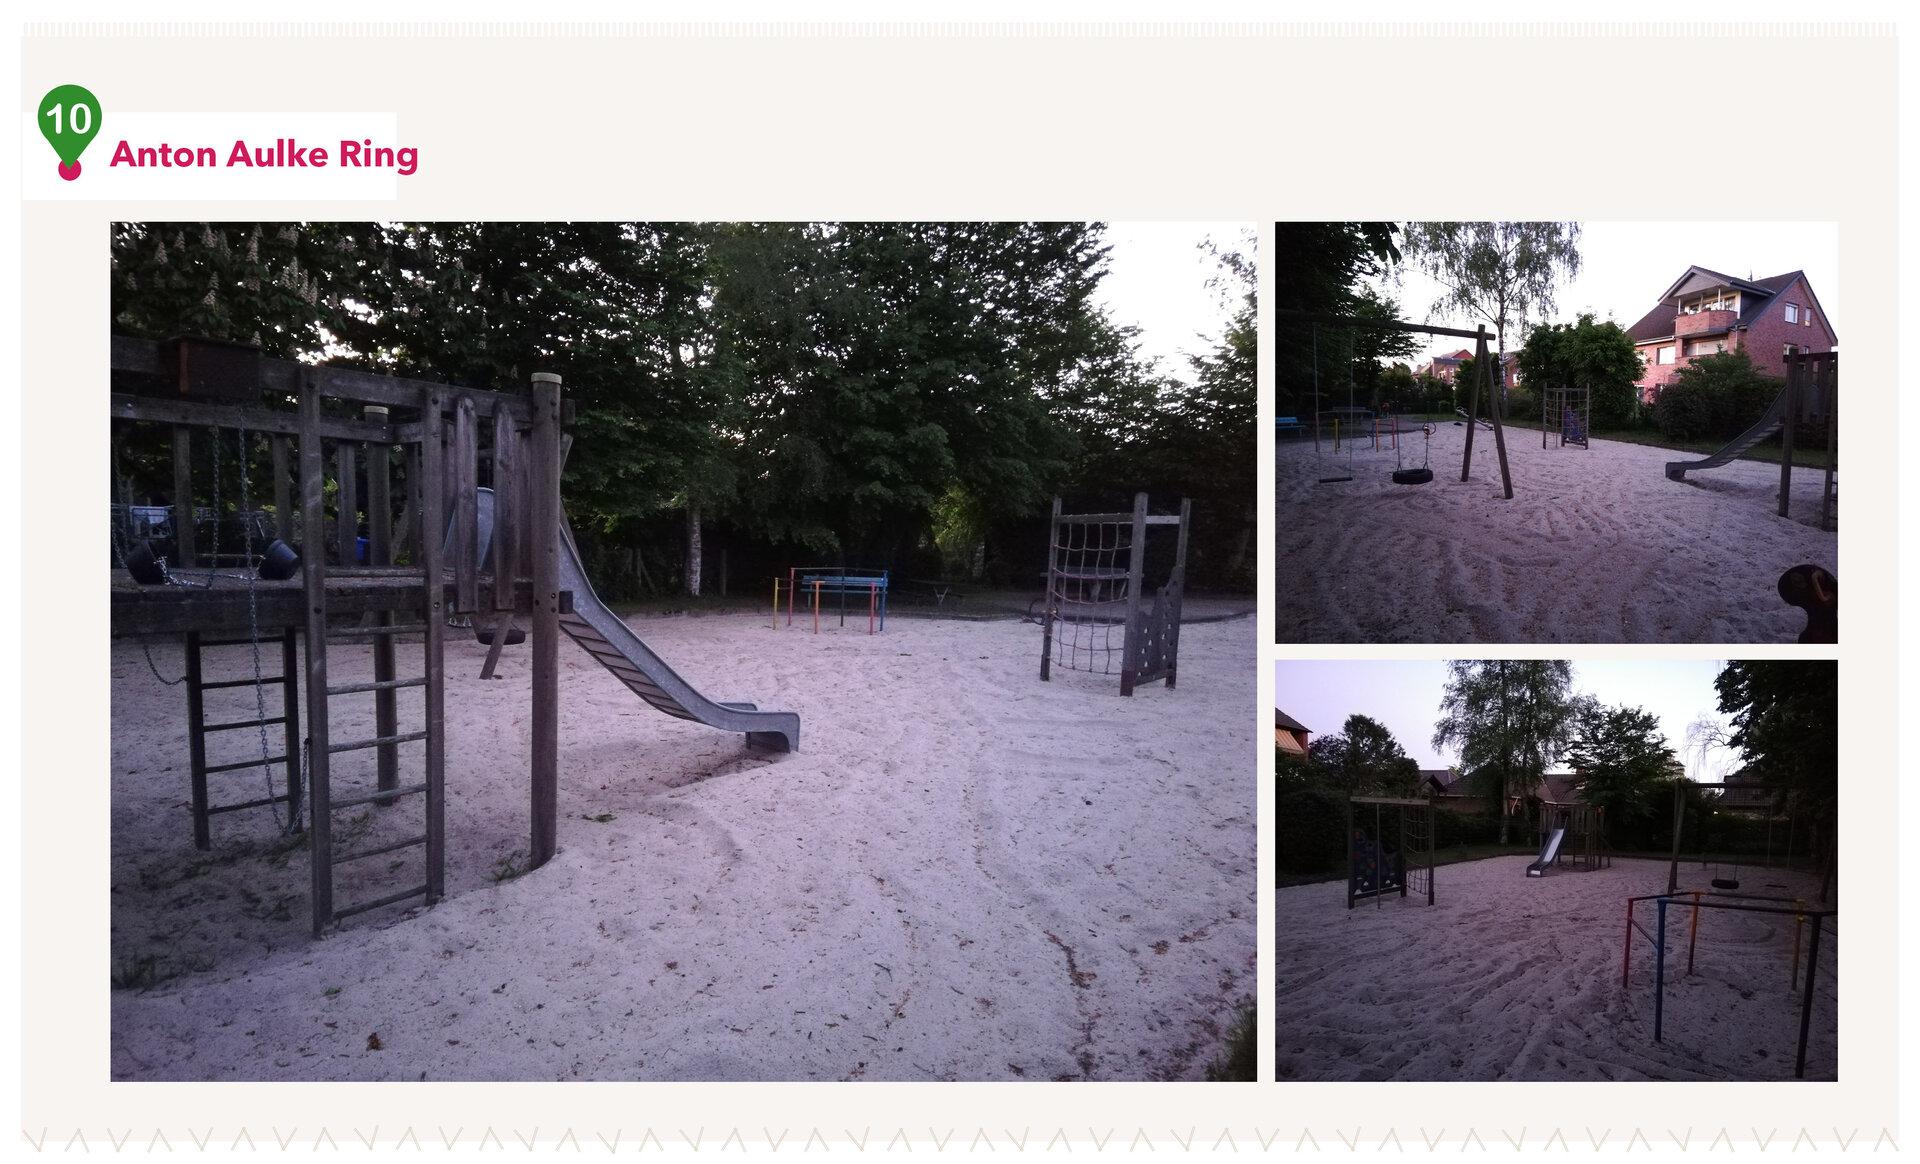 Spielplatz Anton Aulke Ring